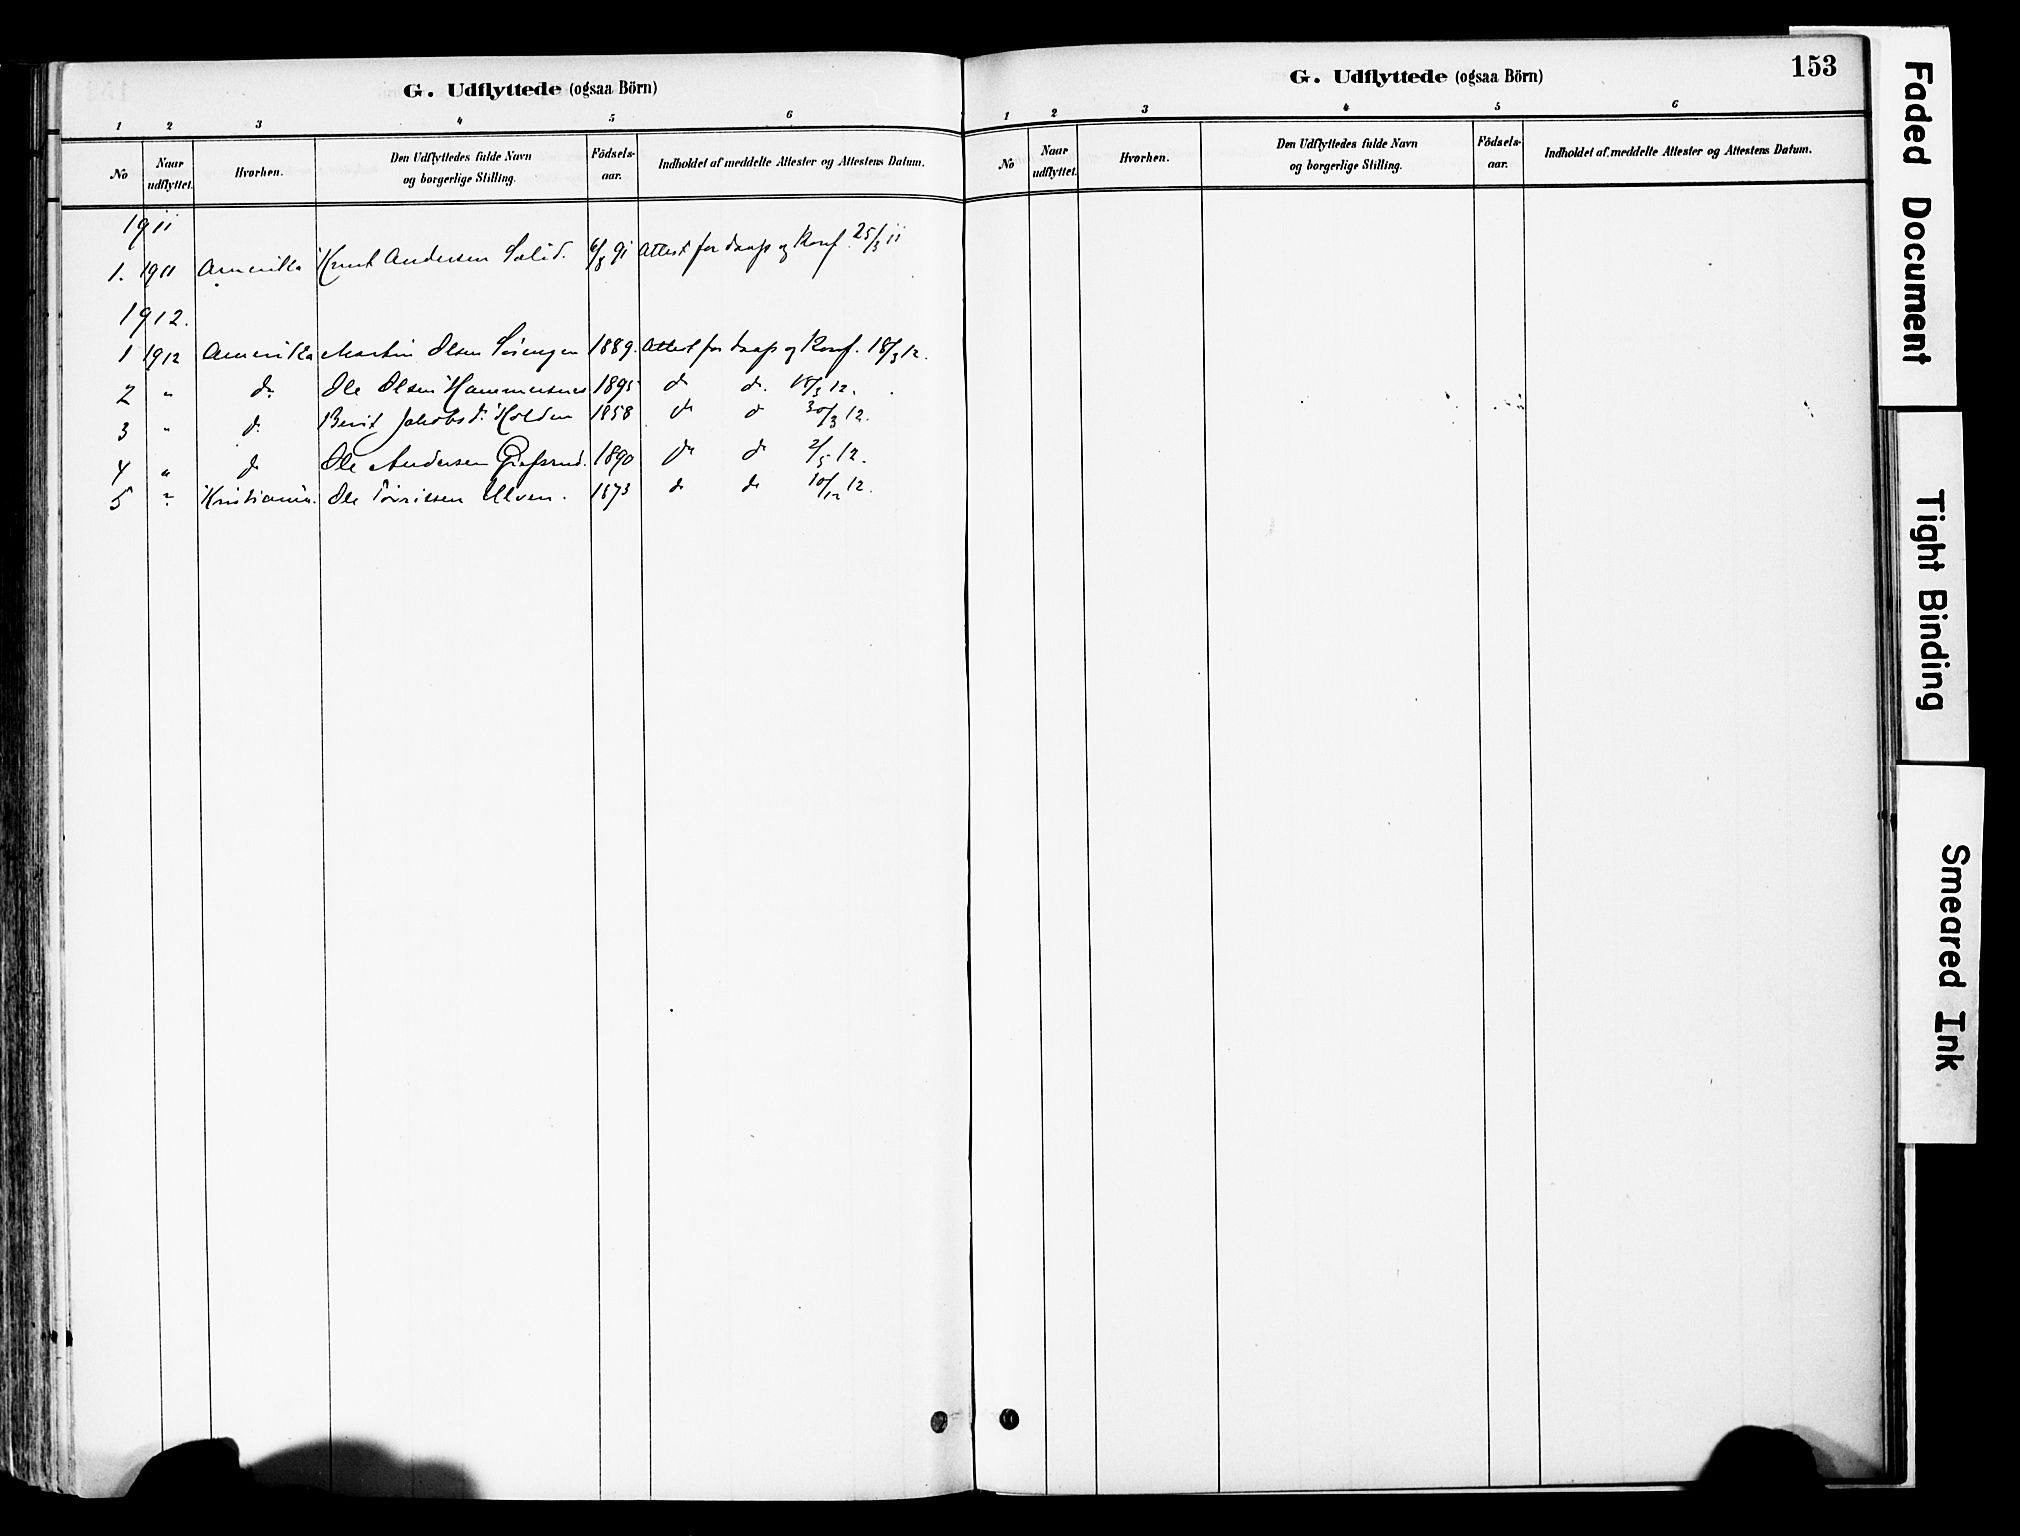 SAH, Vestre Slidre prestekontor, Ministerialbok nr. 6, 1881-1912, s. 153